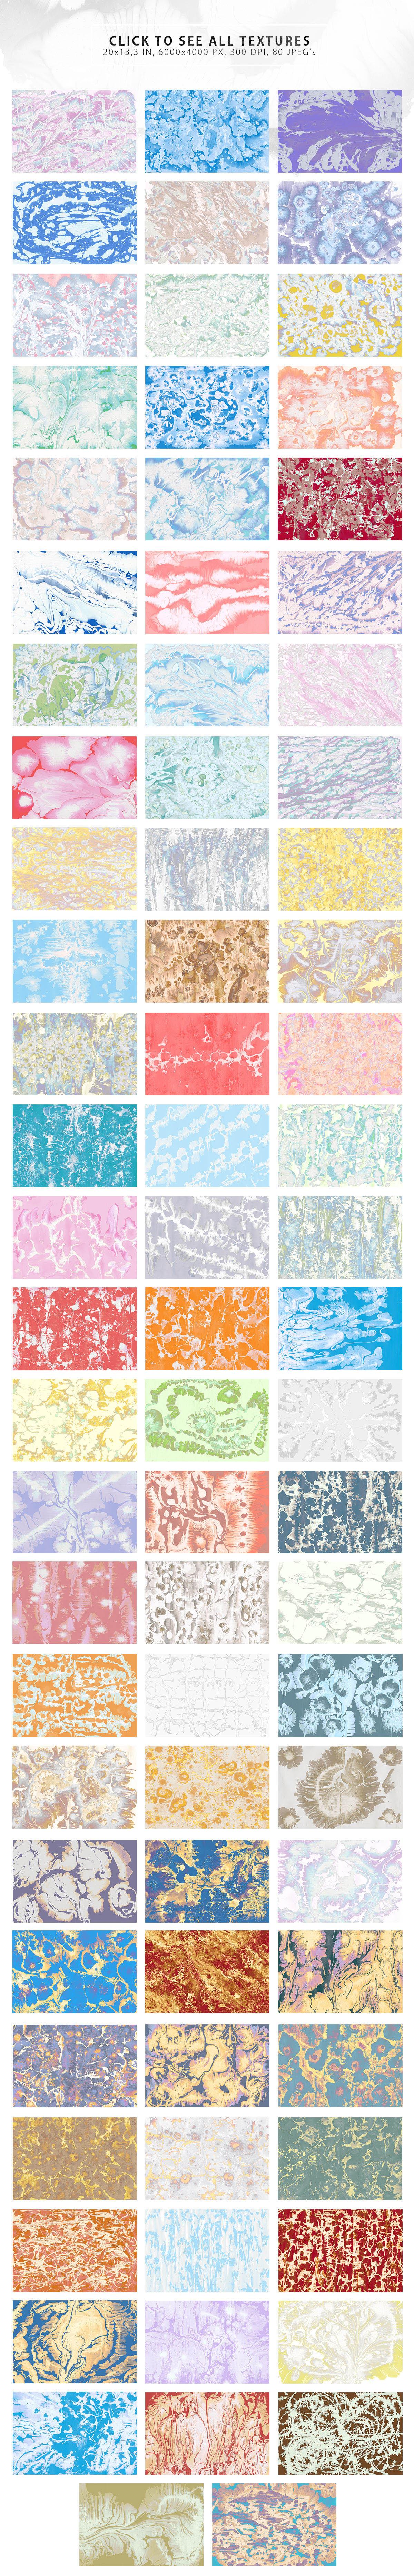 Wet Paint Textures Vol. 1 example image 10